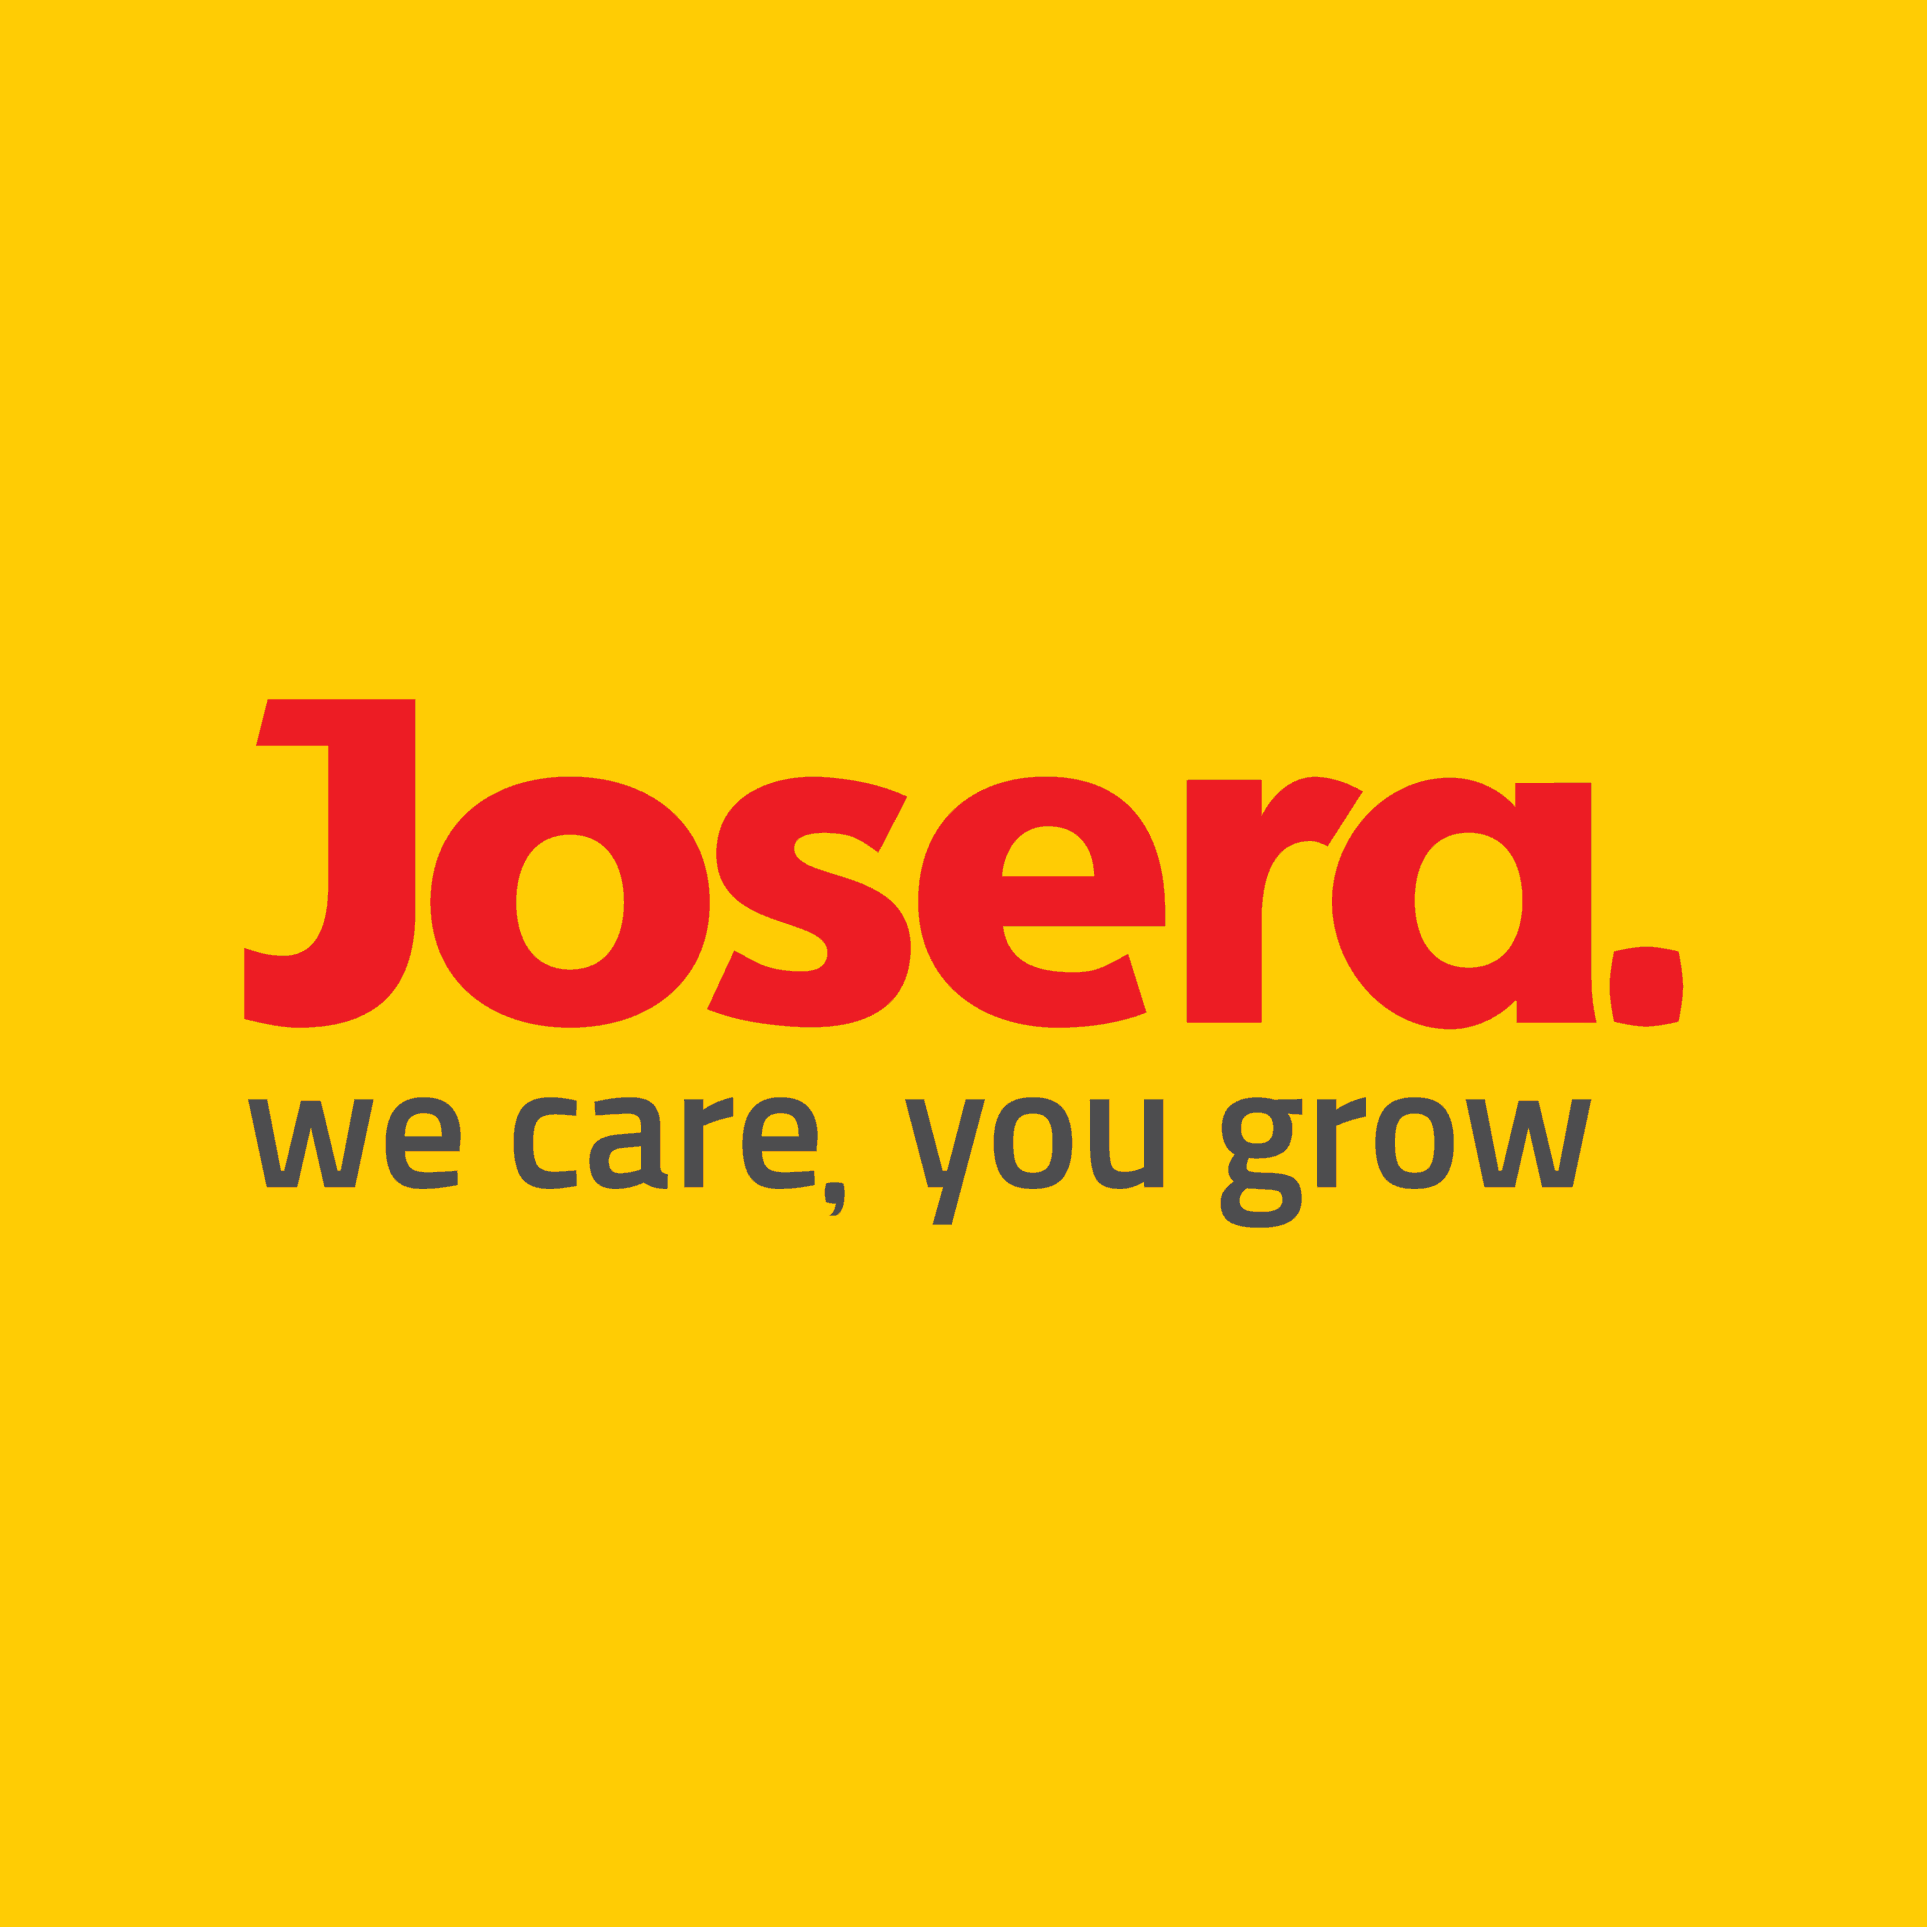 JOSERA Logo we care, you grow